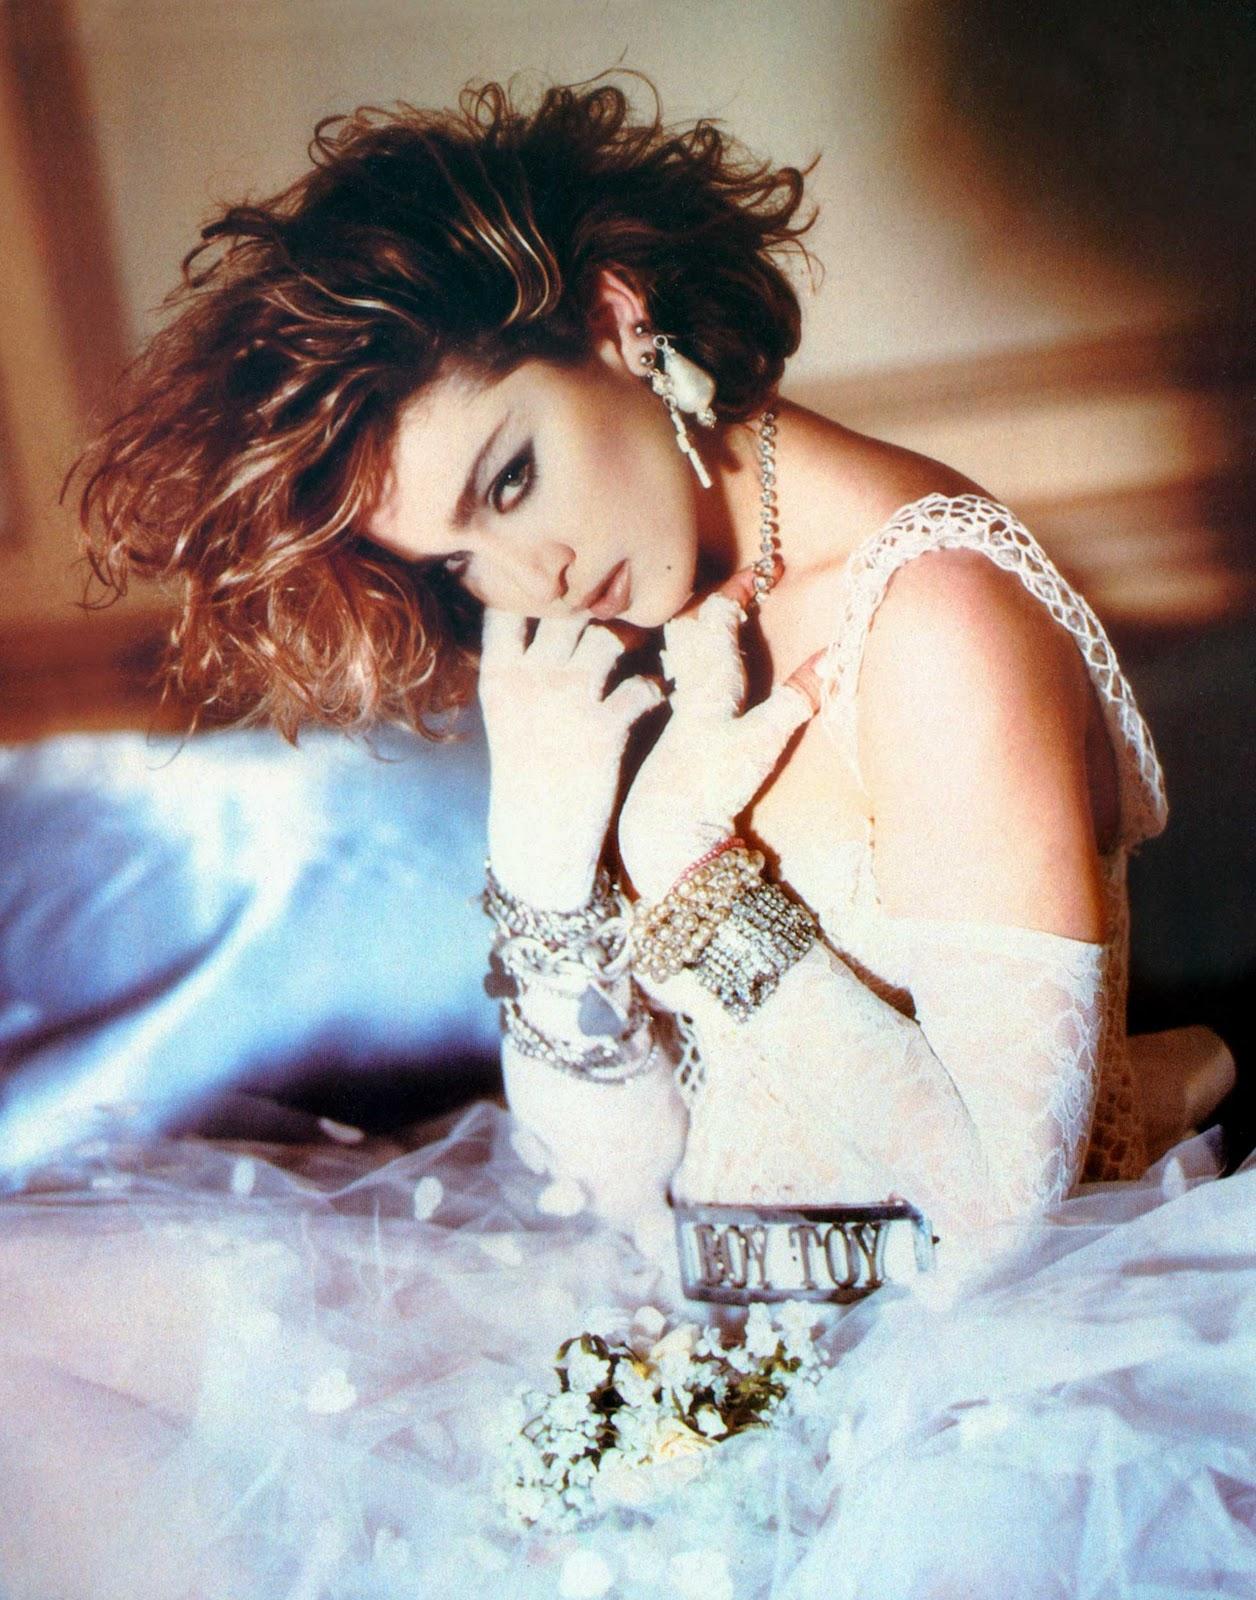 http://4.bp.blogspot.com/_qkdu4uOwe4A/TTDqbglKK4I/AAAAAAAABj4/nMHGbG5JZ6A/s1600/Madonna1.jpg